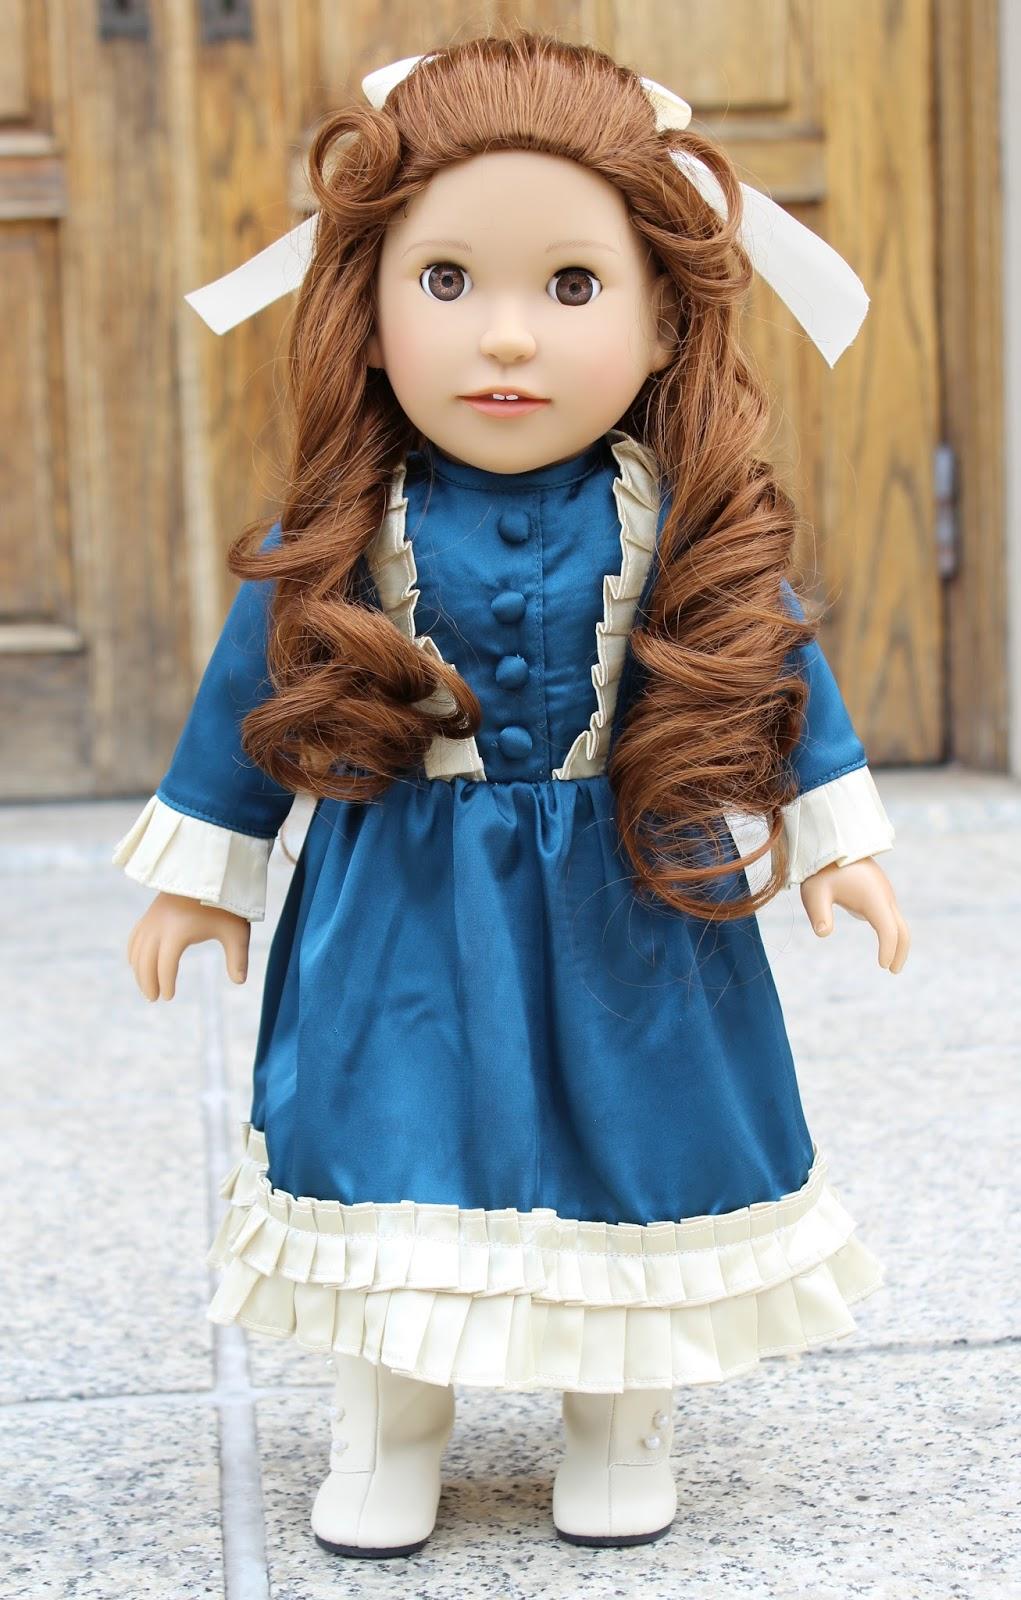 Dolls From Heaven : dolls, heaven, Living, Doll's, Introducing, Dolls, Heaven